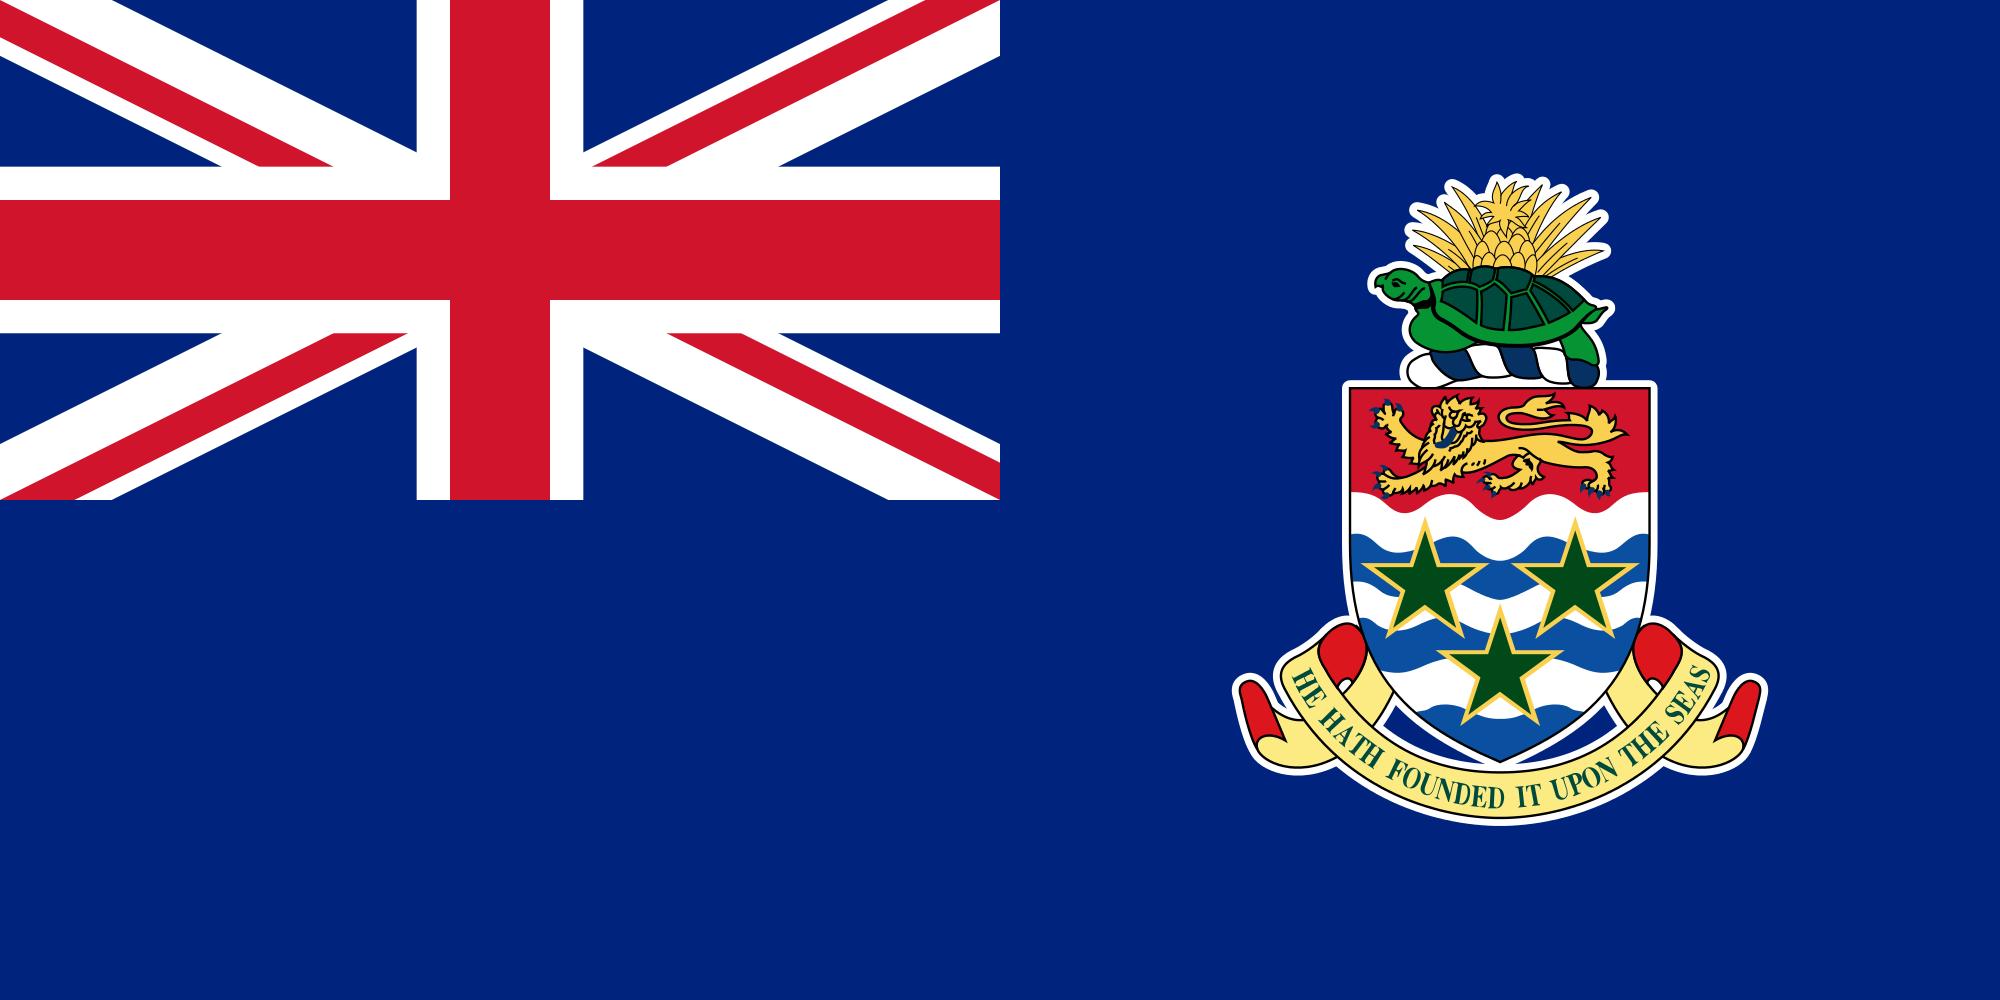 islas caimán, pays, emblème, logo, symbole - Fonds d'écran HD - Professor-falken.com